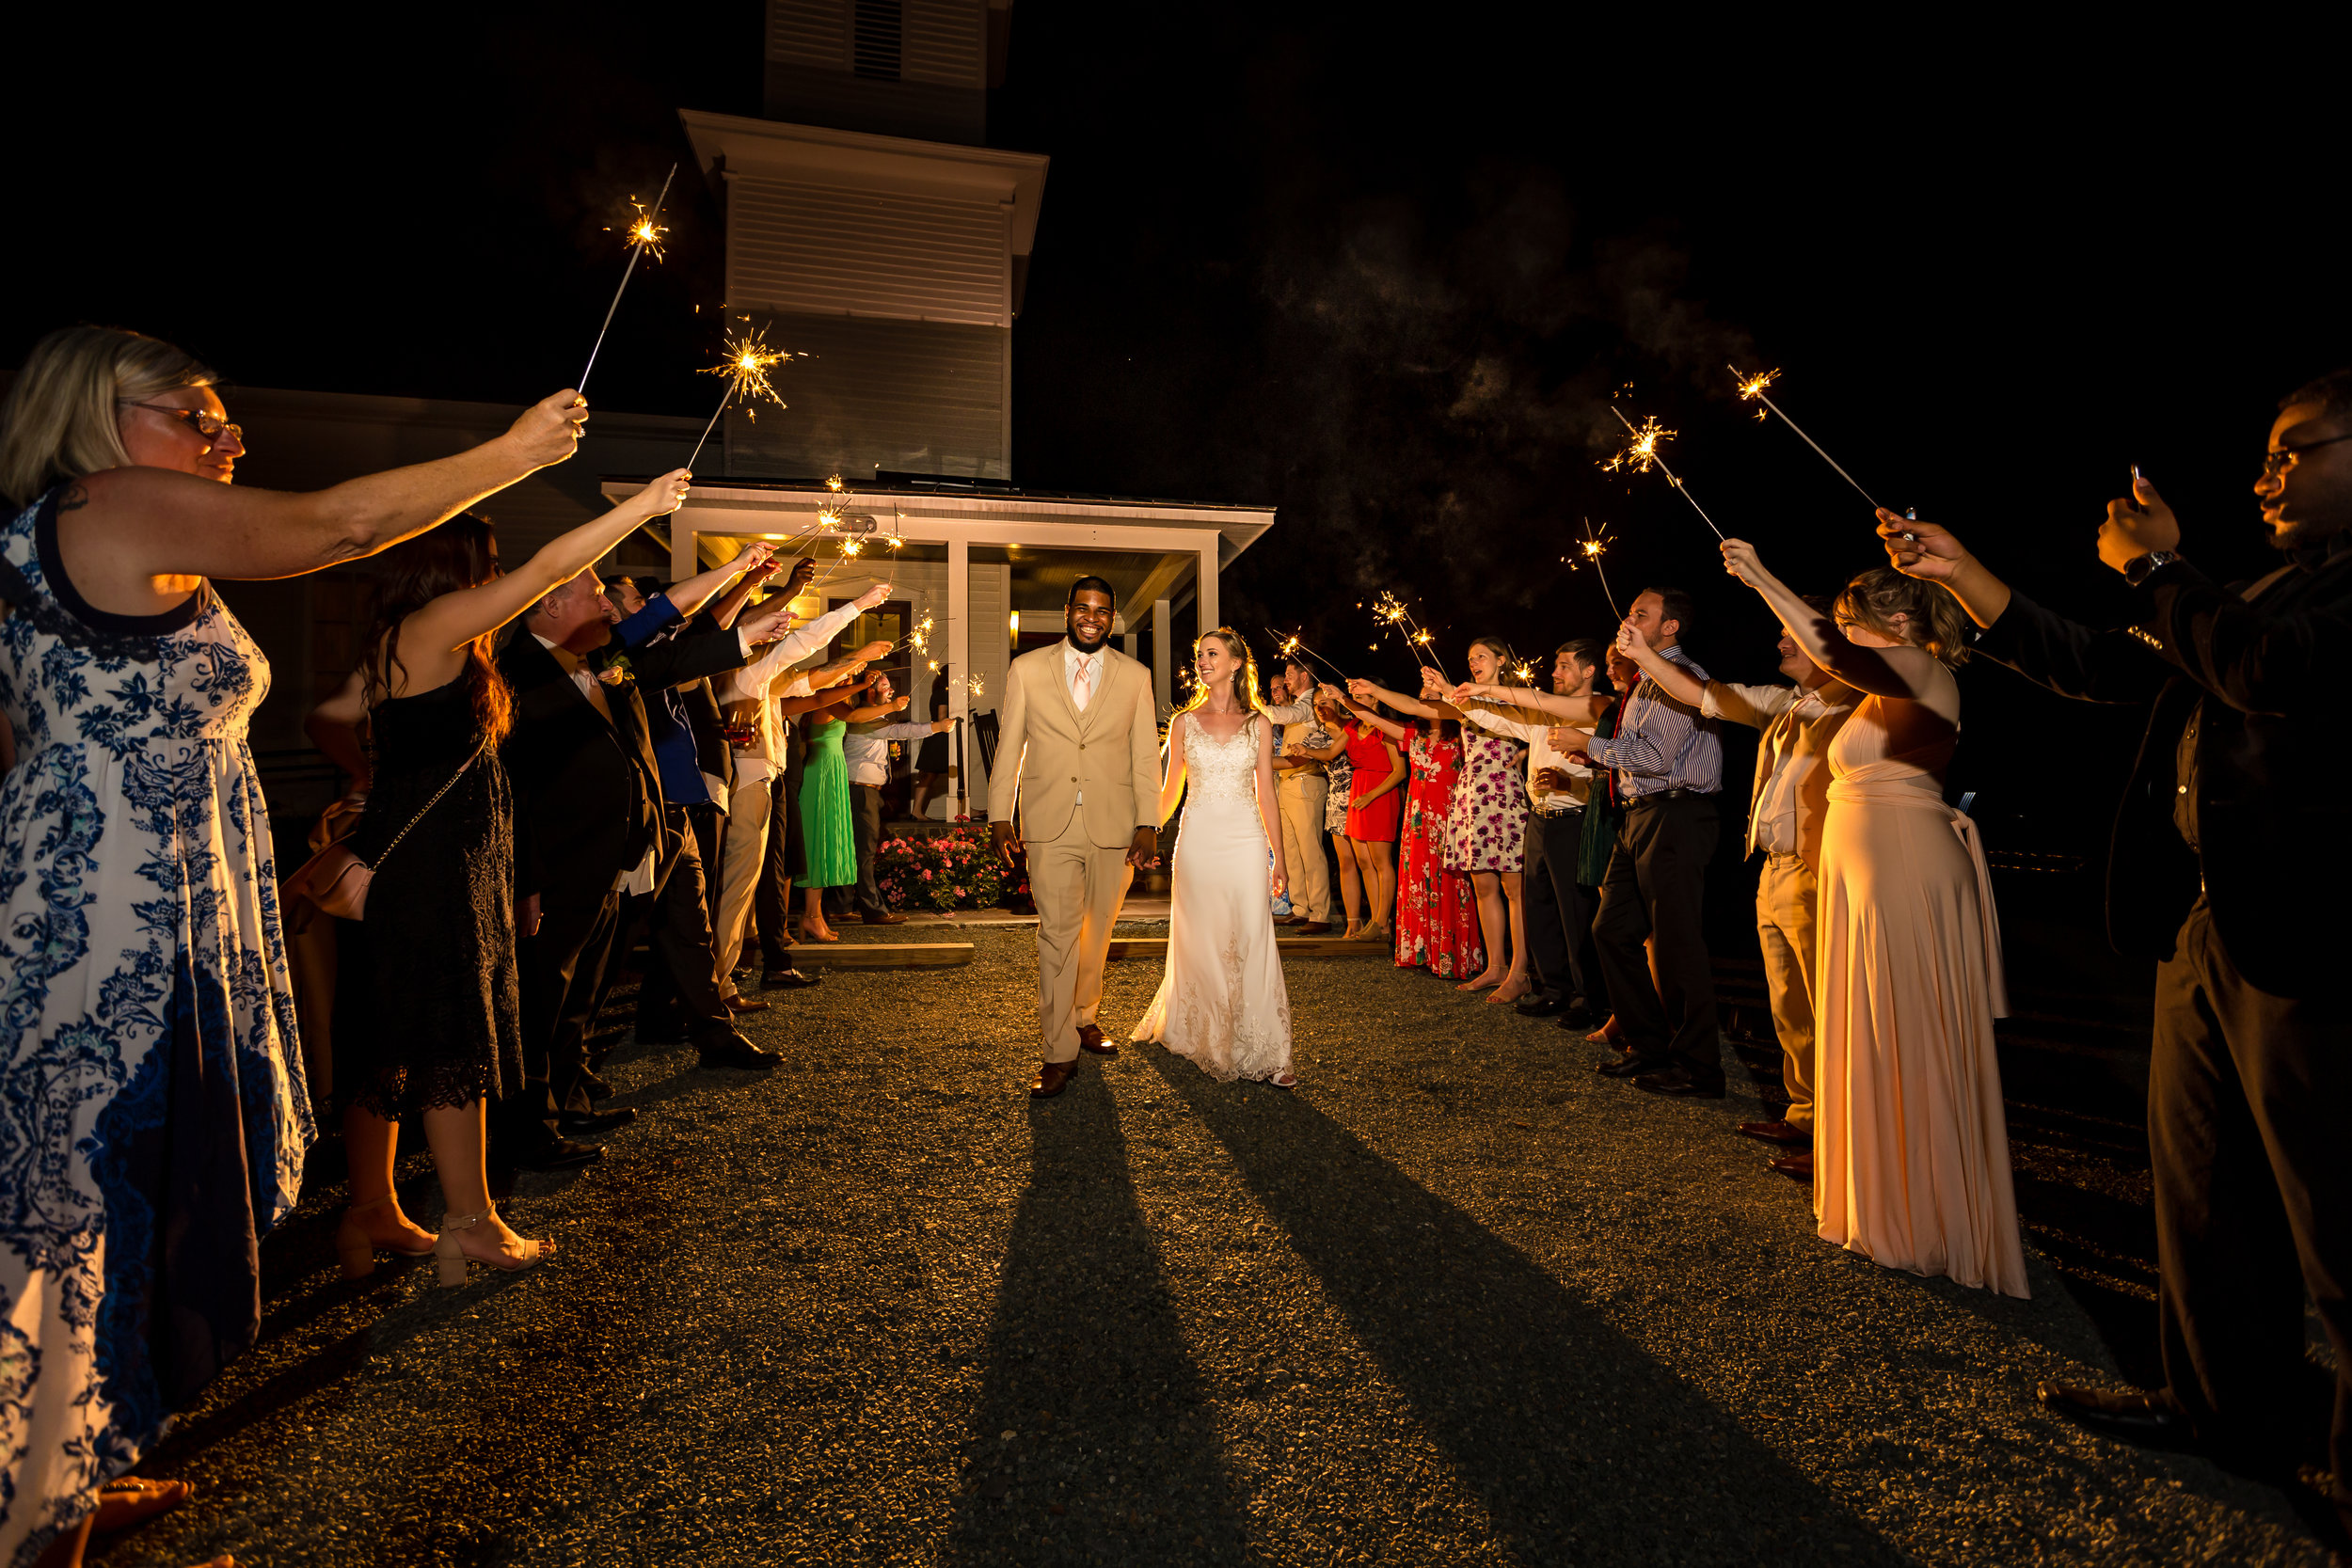 sarah_ikeem_wedding_at_the_parlour_at_manns_chapel_05.18.19-2110.jpg